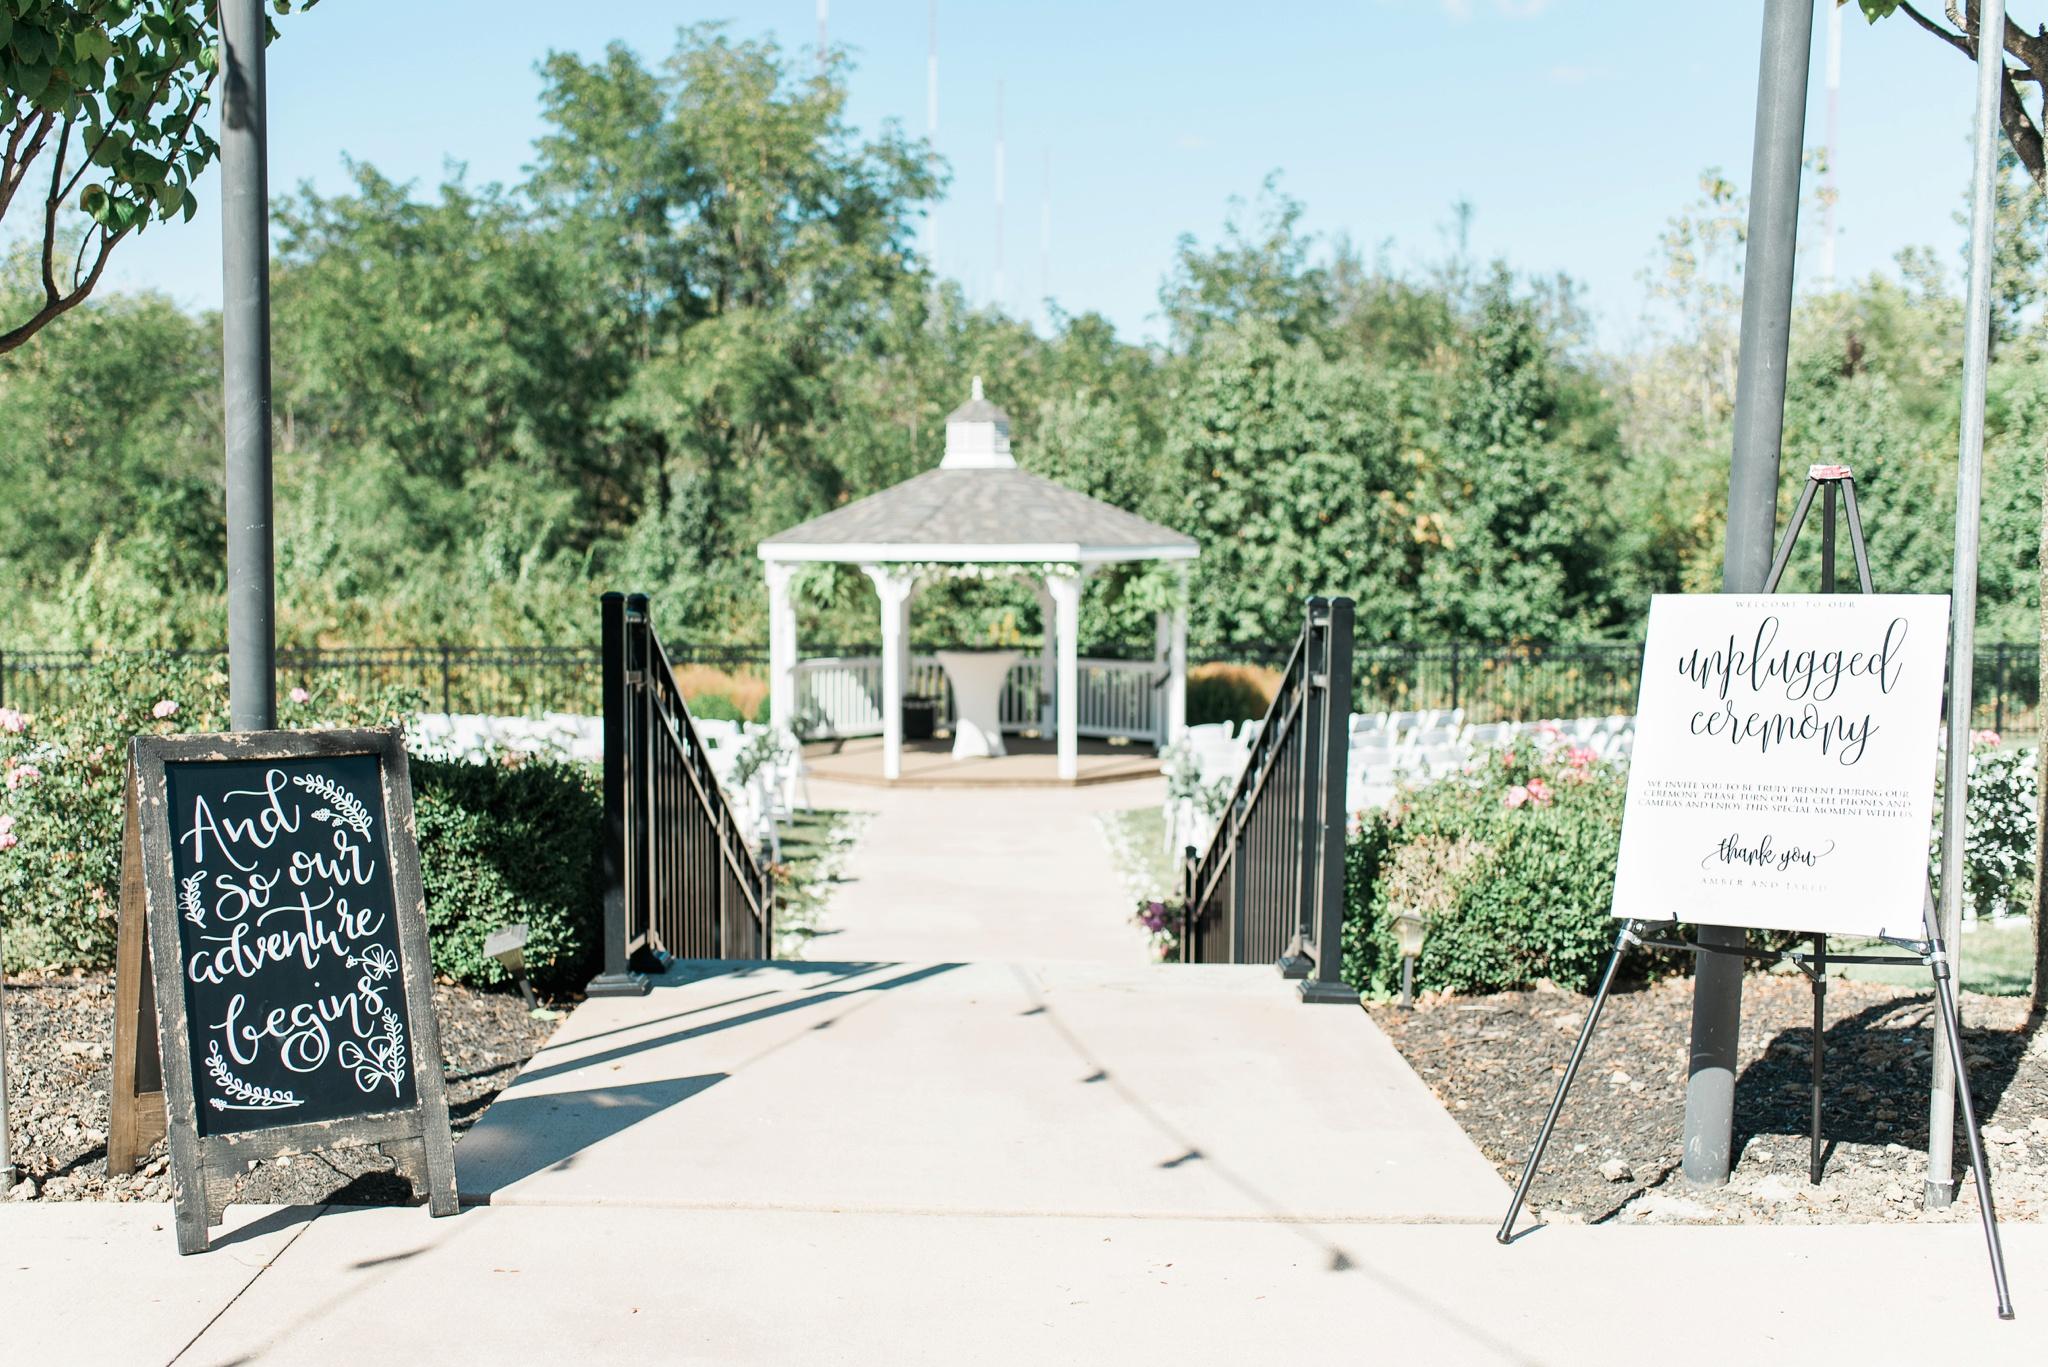 aladdin-shrine-center-wedding-grove-city-ohio-amber-jared_0104.jpg